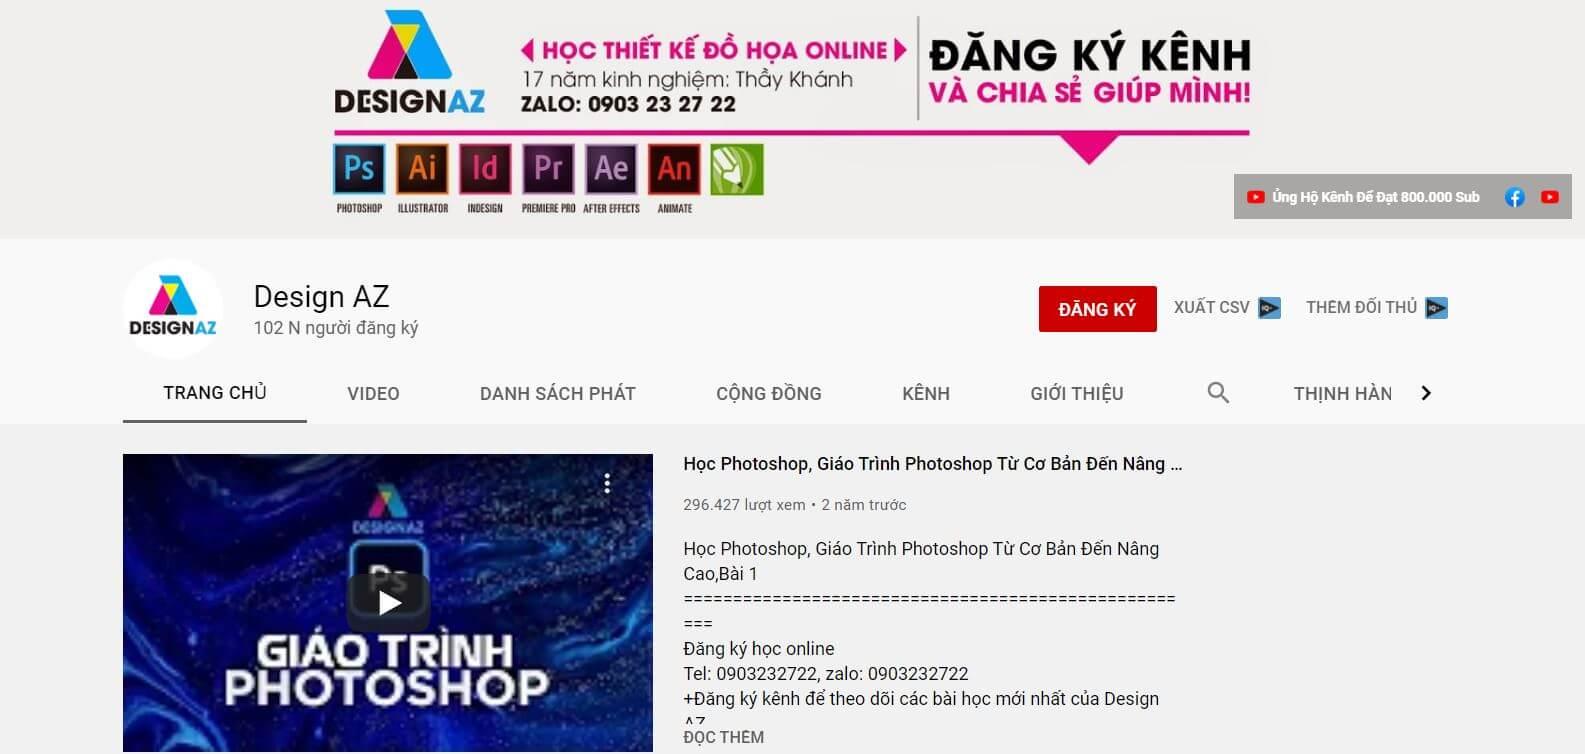 design-az-ban-khoa-hoc-online